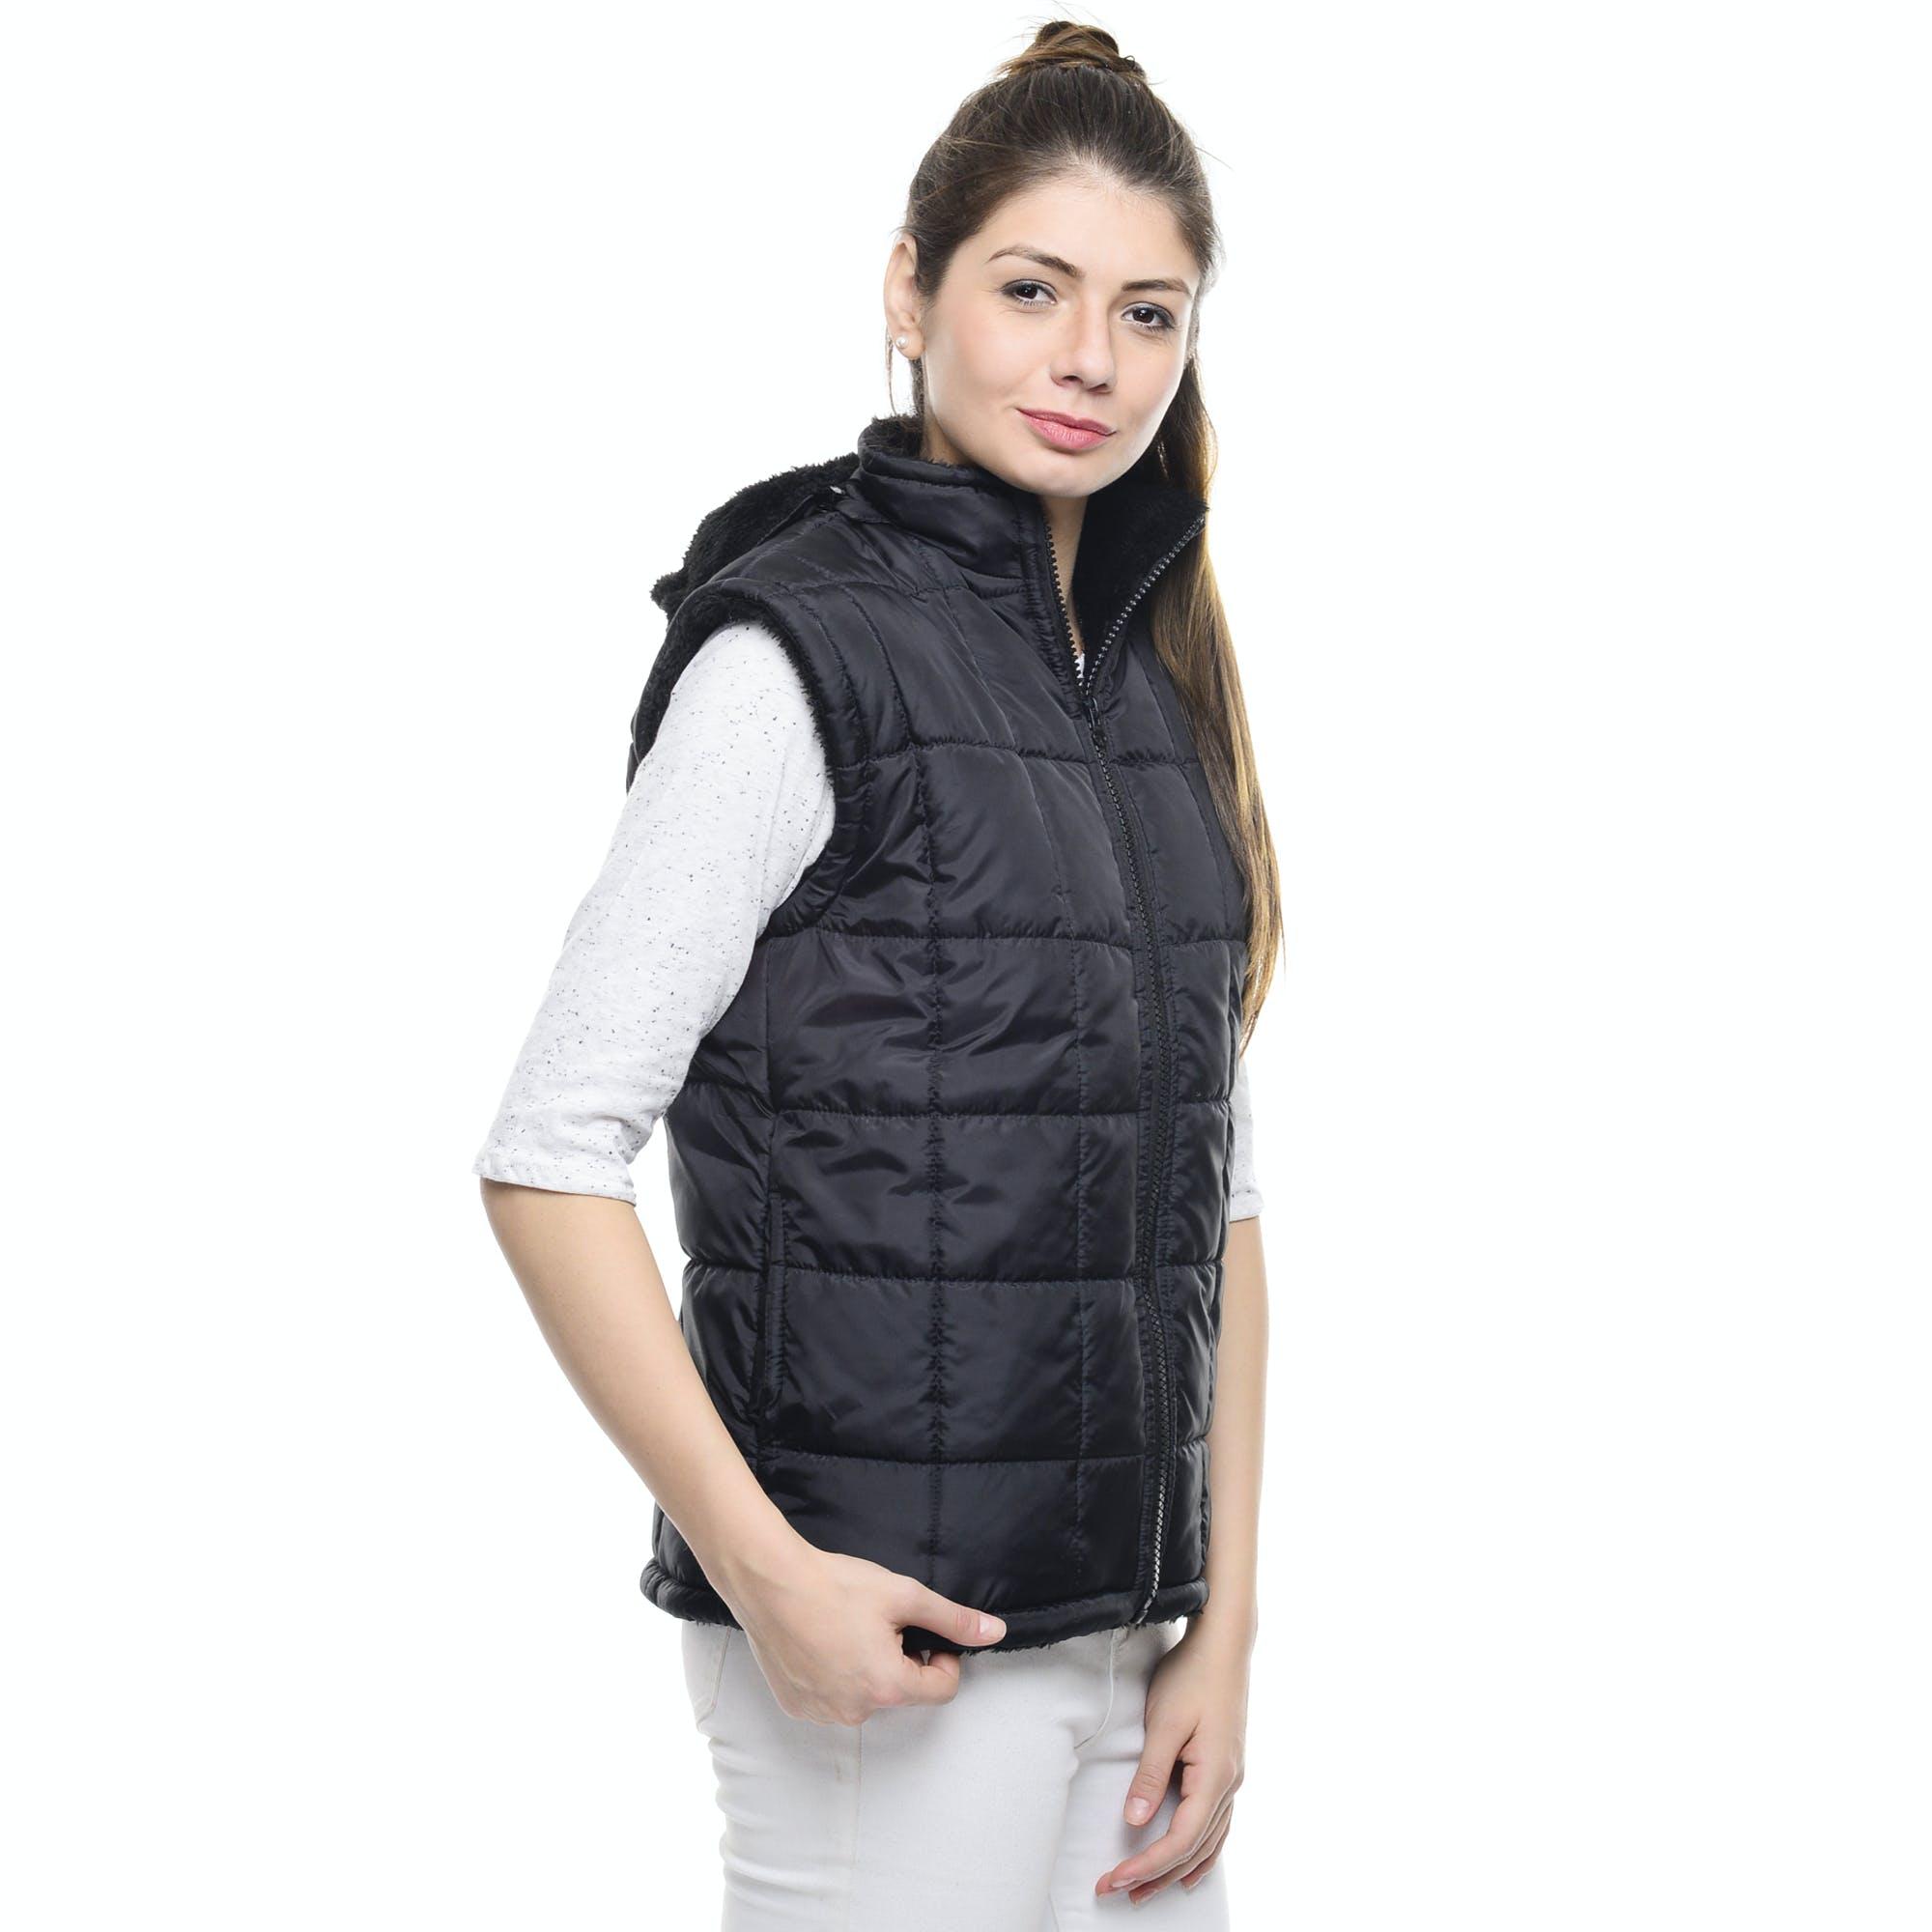 Woman Standing Wearing Black Bubble Zip Turtleneck Vest